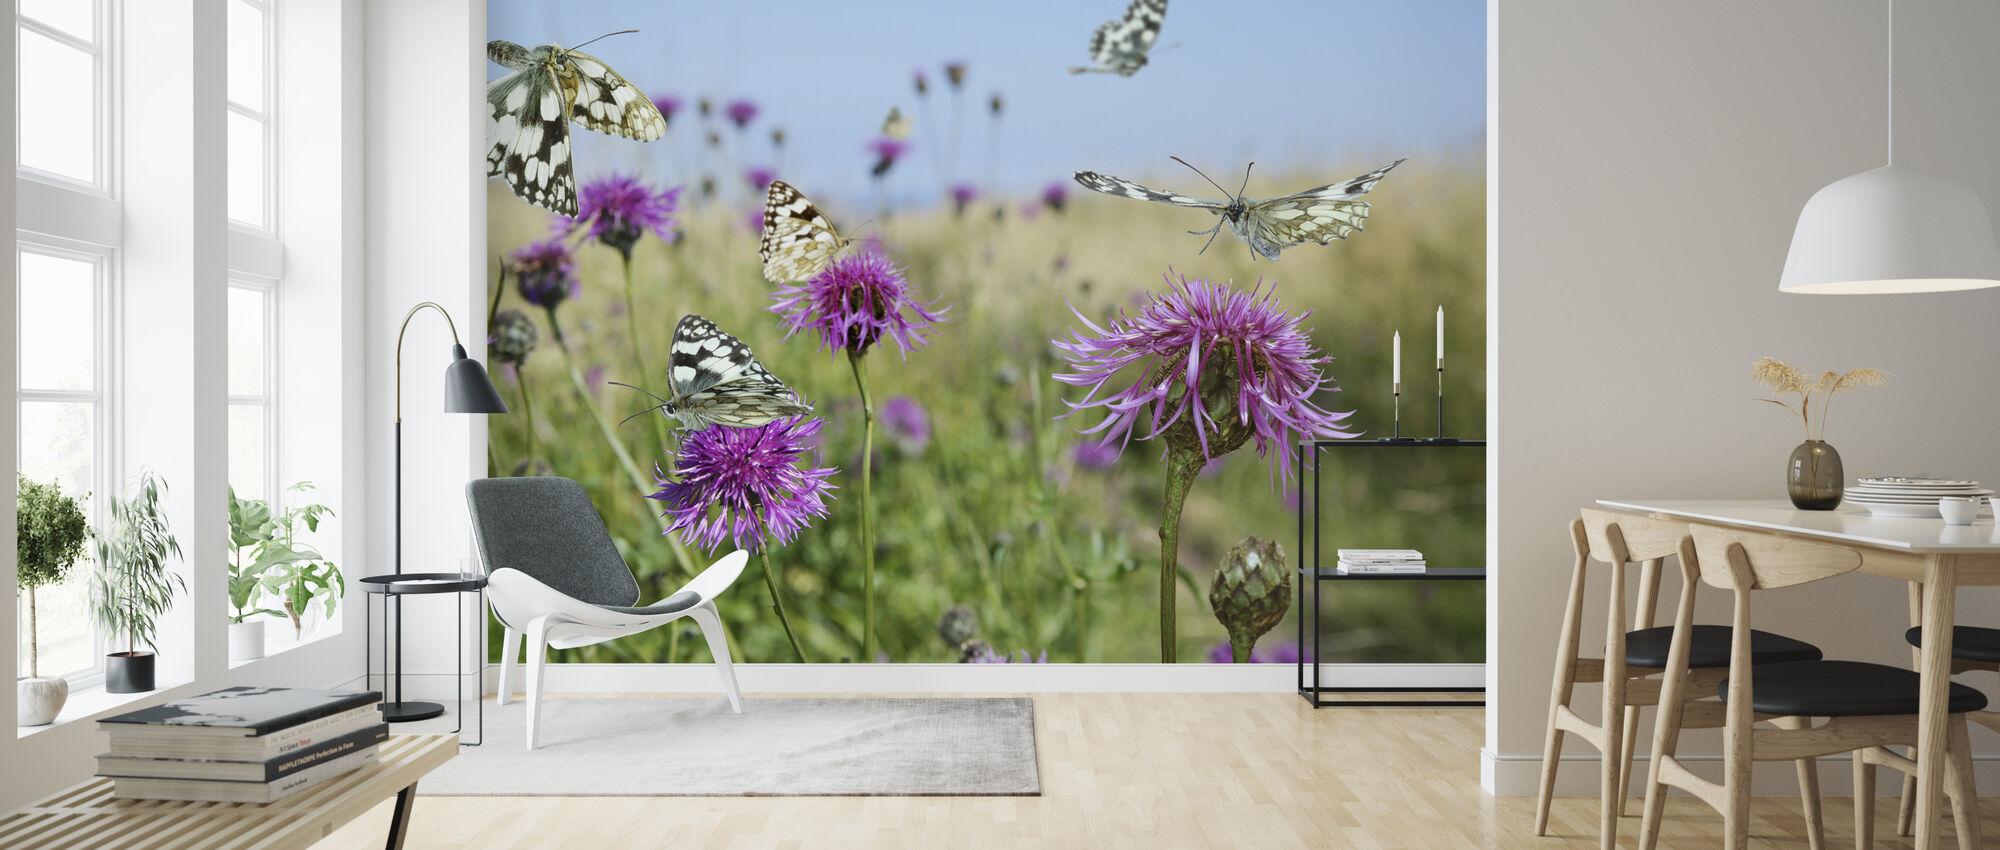 Marbled White Butterflies - Wallpaper - Living Room